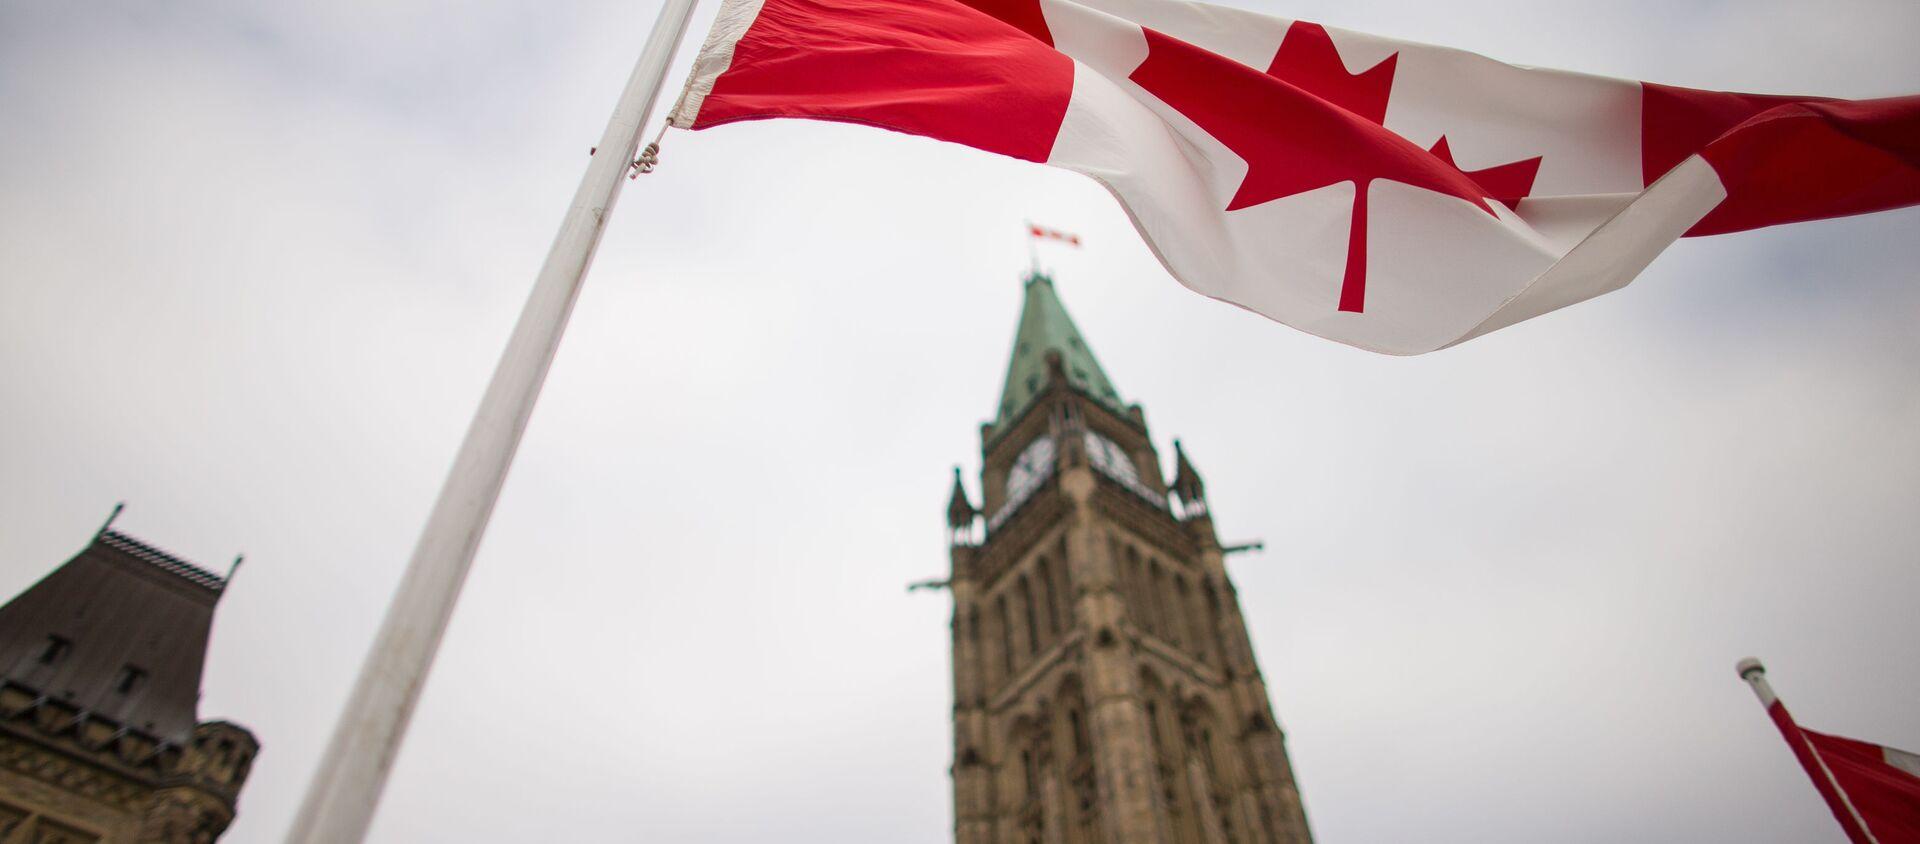 Parlamento canadese - Sputnik Italia, 1920, 19.02.2021